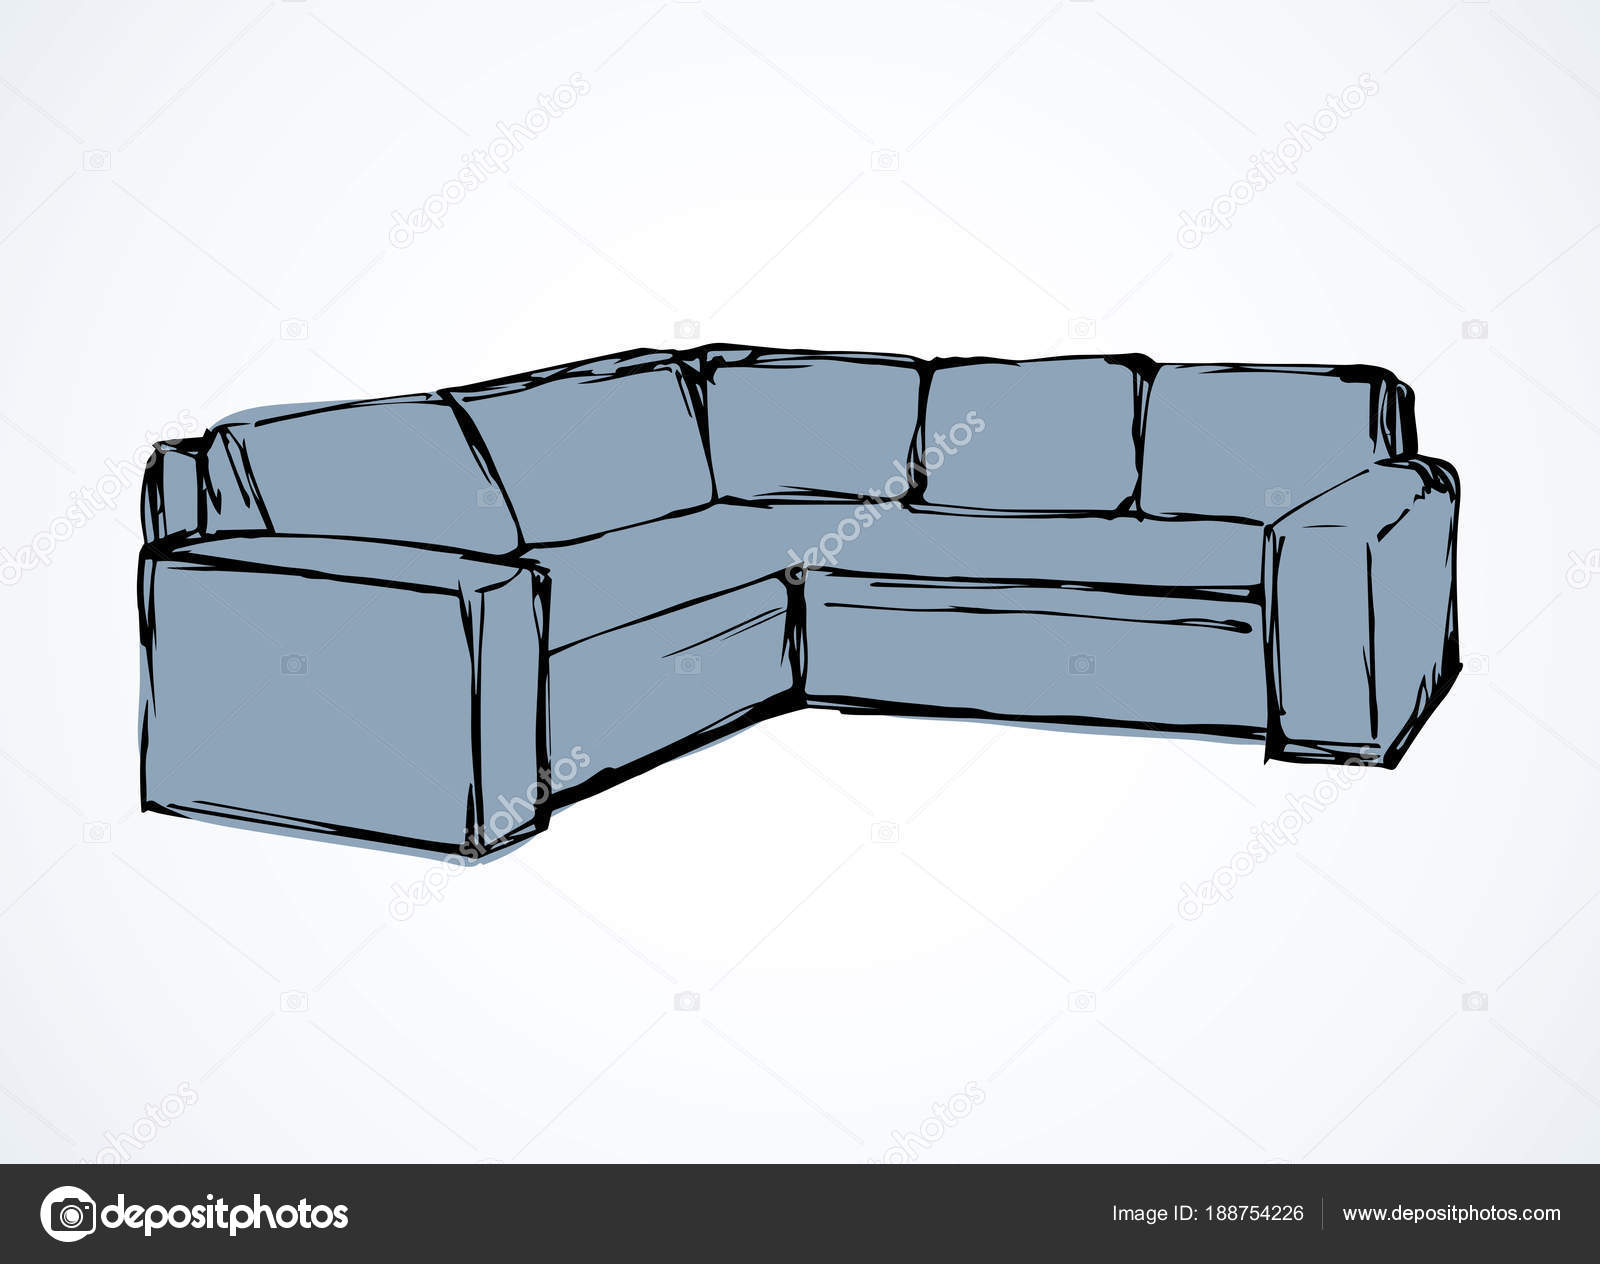 canapé. dessin vectoriel — image vectorielle marinka © #188754226